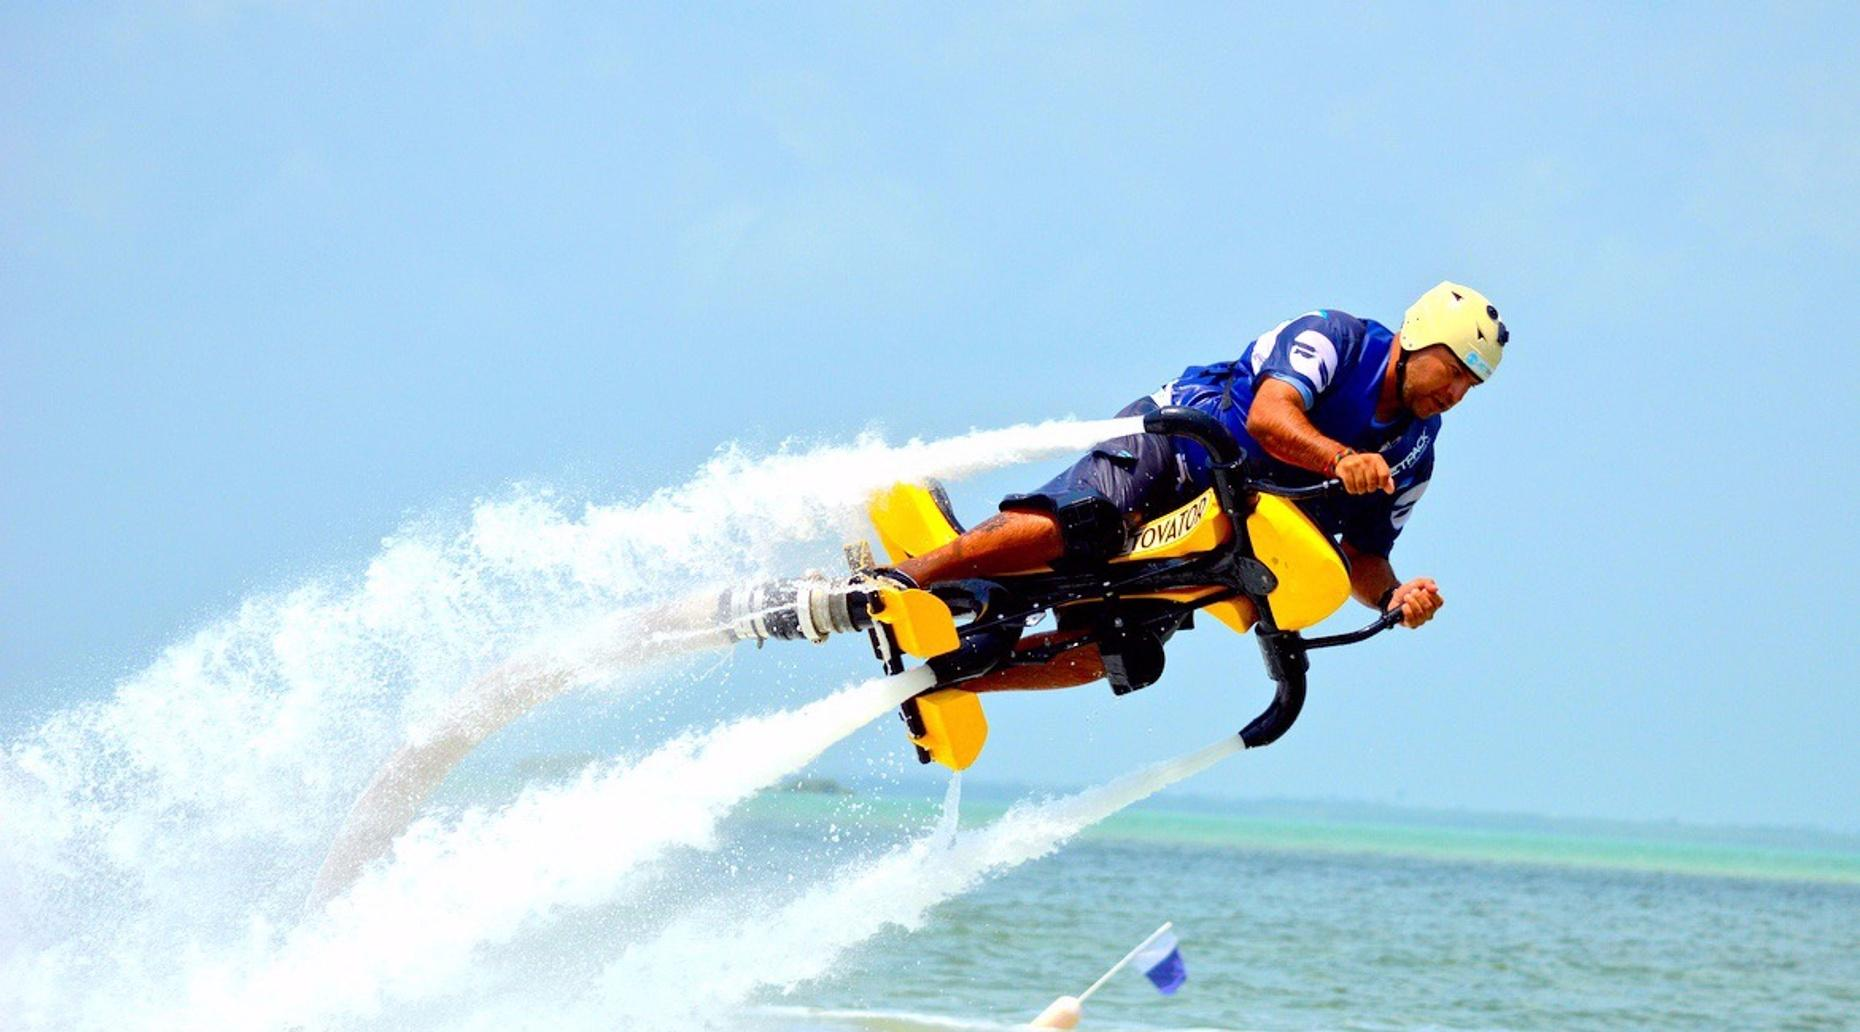 Jetovator Flight and Lesson in Cancun